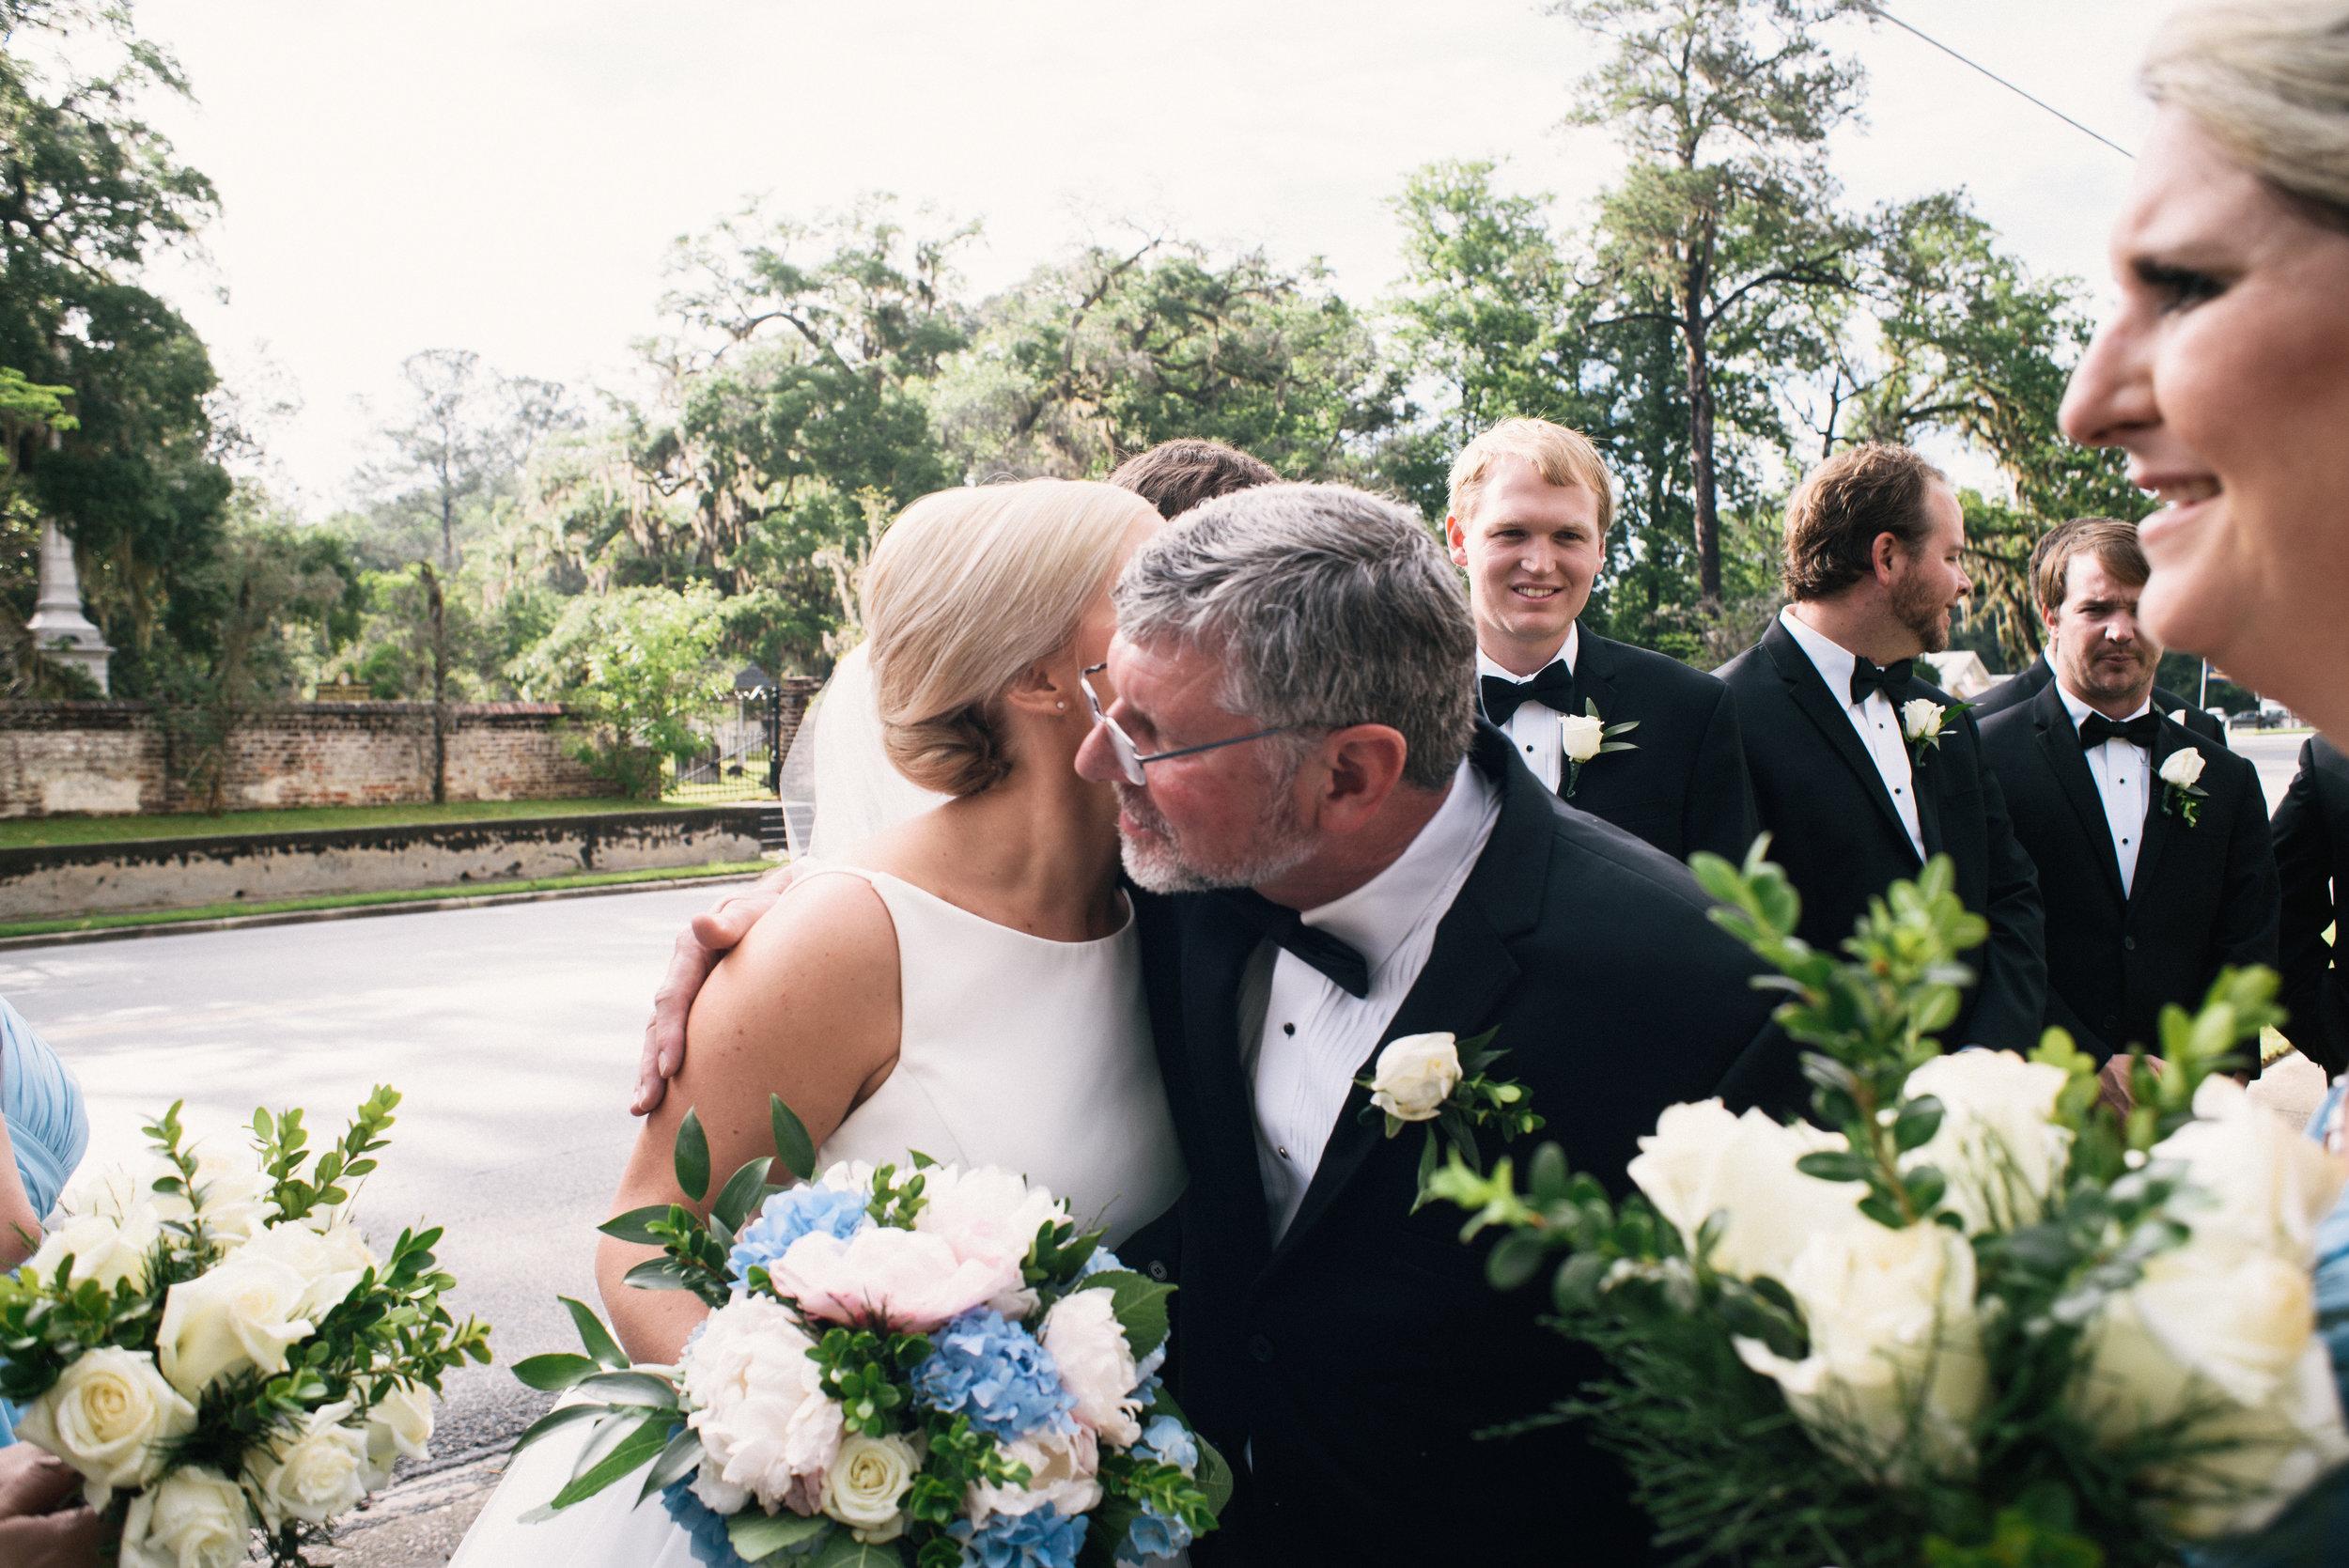 ali-and-jared-savannah-georgia-may-2017-wedding-meg-hill-photo-(351of760).jpg